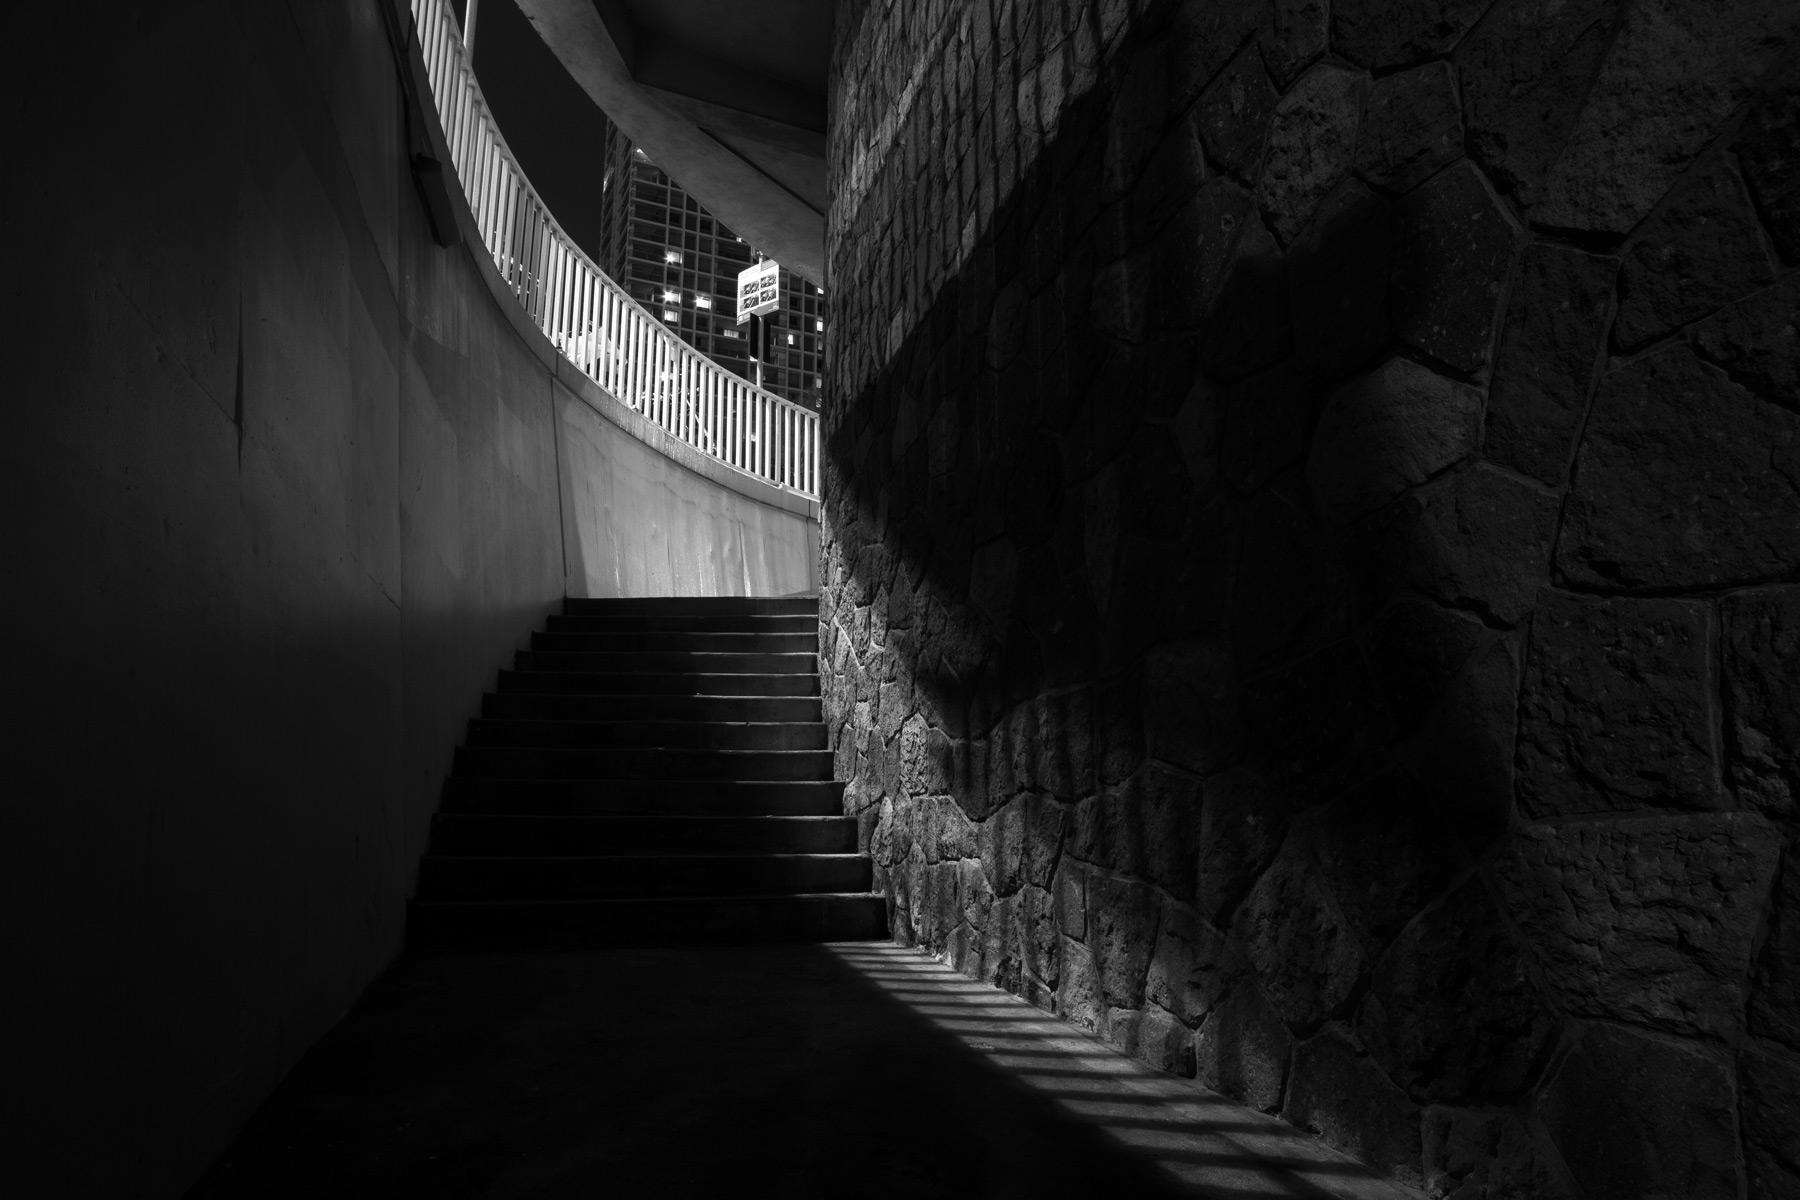 Stairs in the Brisbane CBD at night